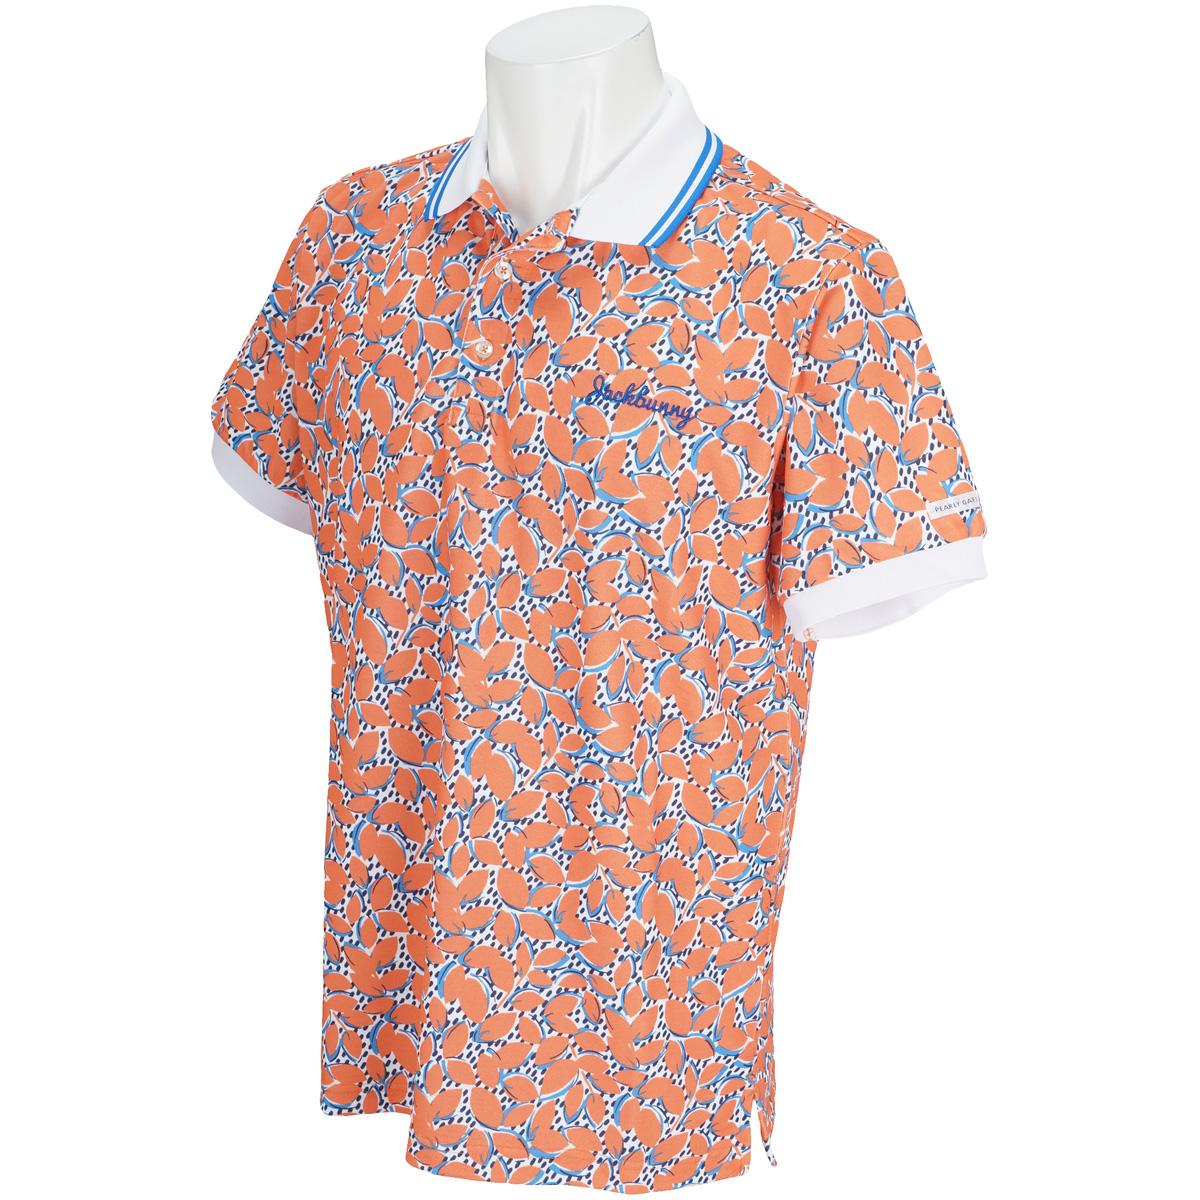 policott 鹿の子 半袖ポロシャツ